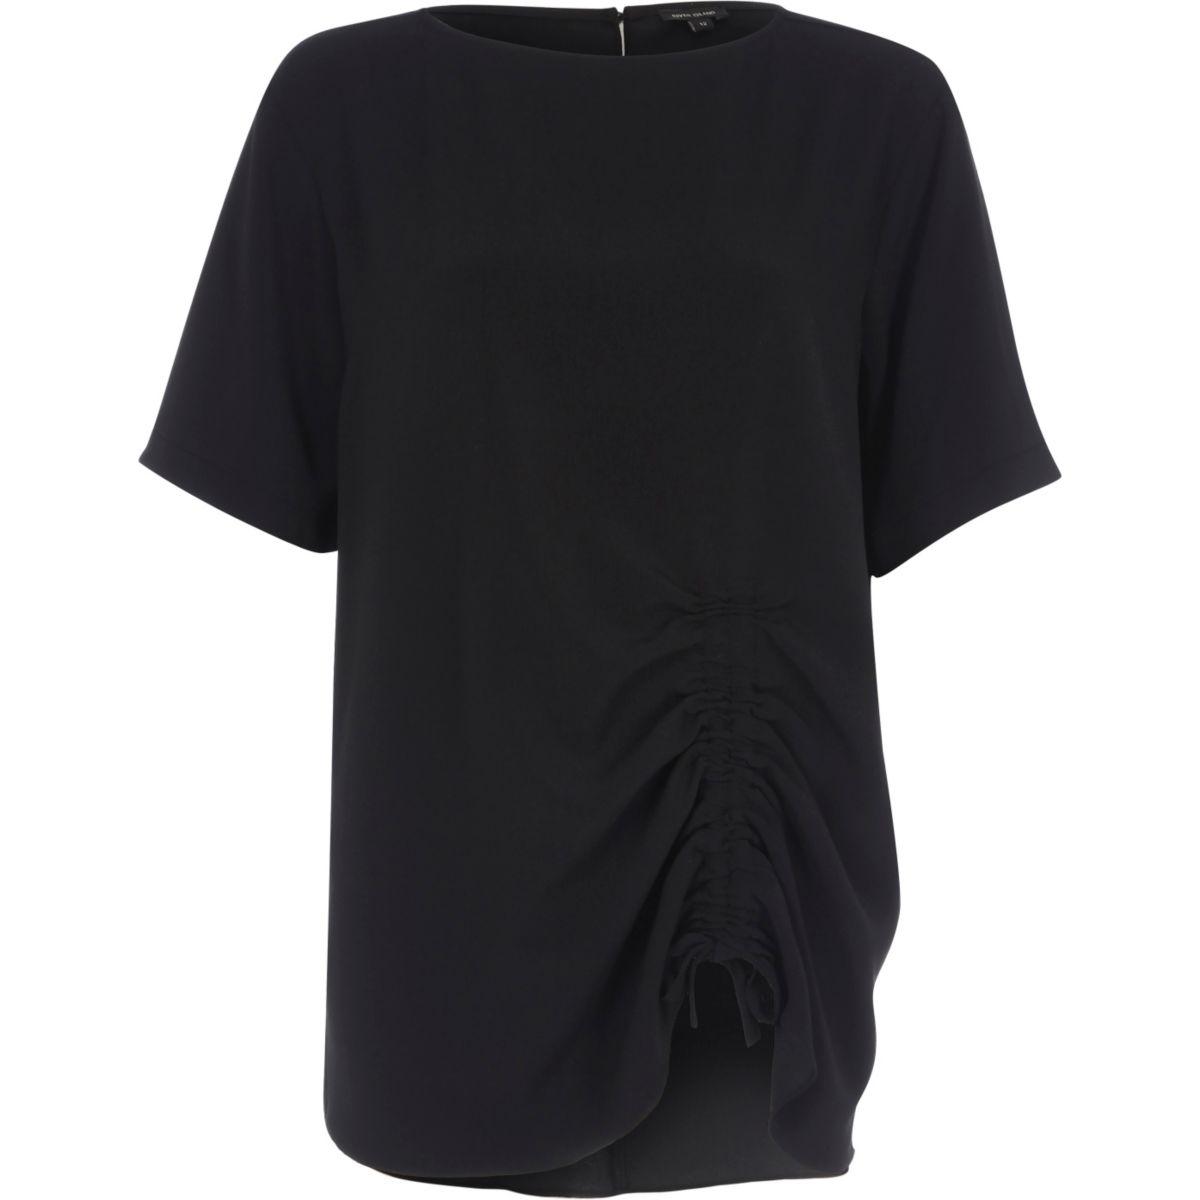 Black ruched drawstring oversized T-shirt